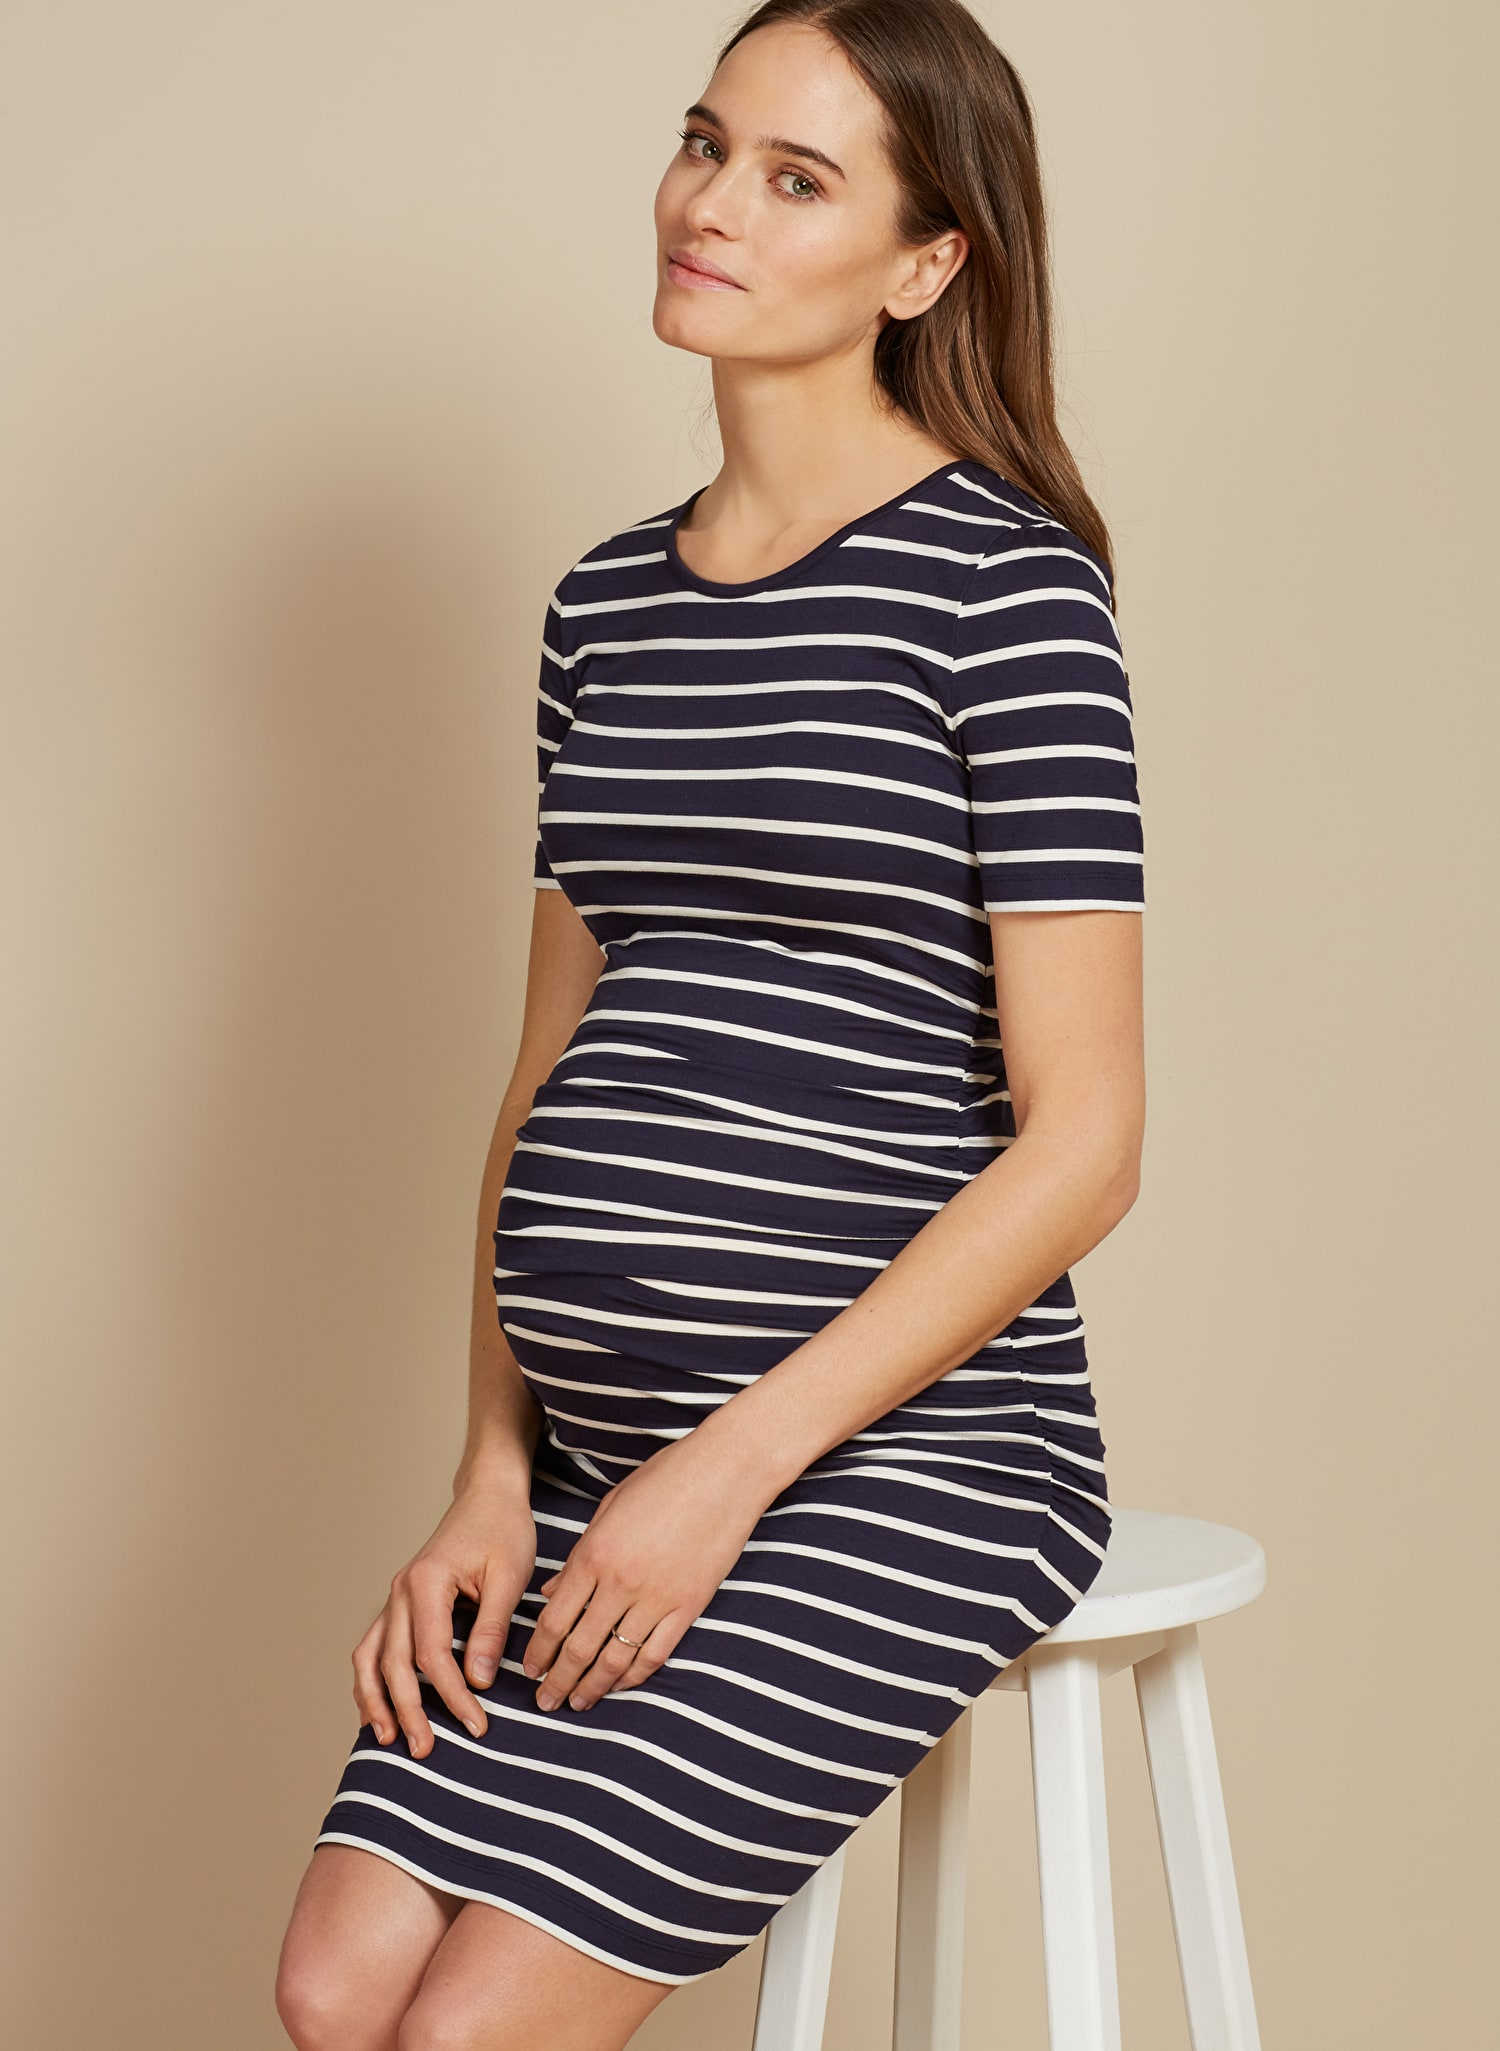 Women's Clothing Maternity Dress Dresses